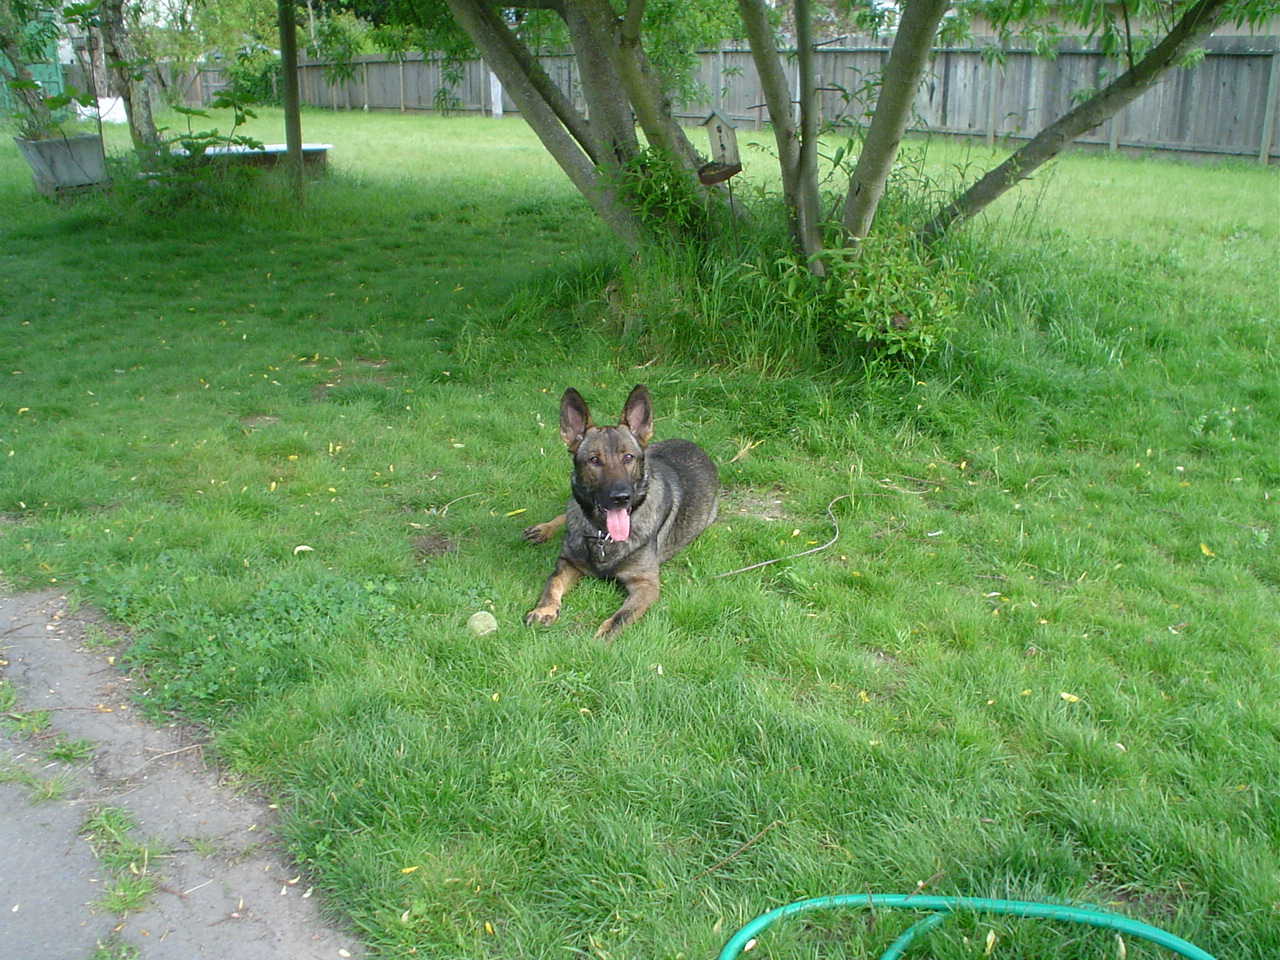 Dante, taken April 20,2011 Passed Sept 29, 2011. Memorial post on my blog.